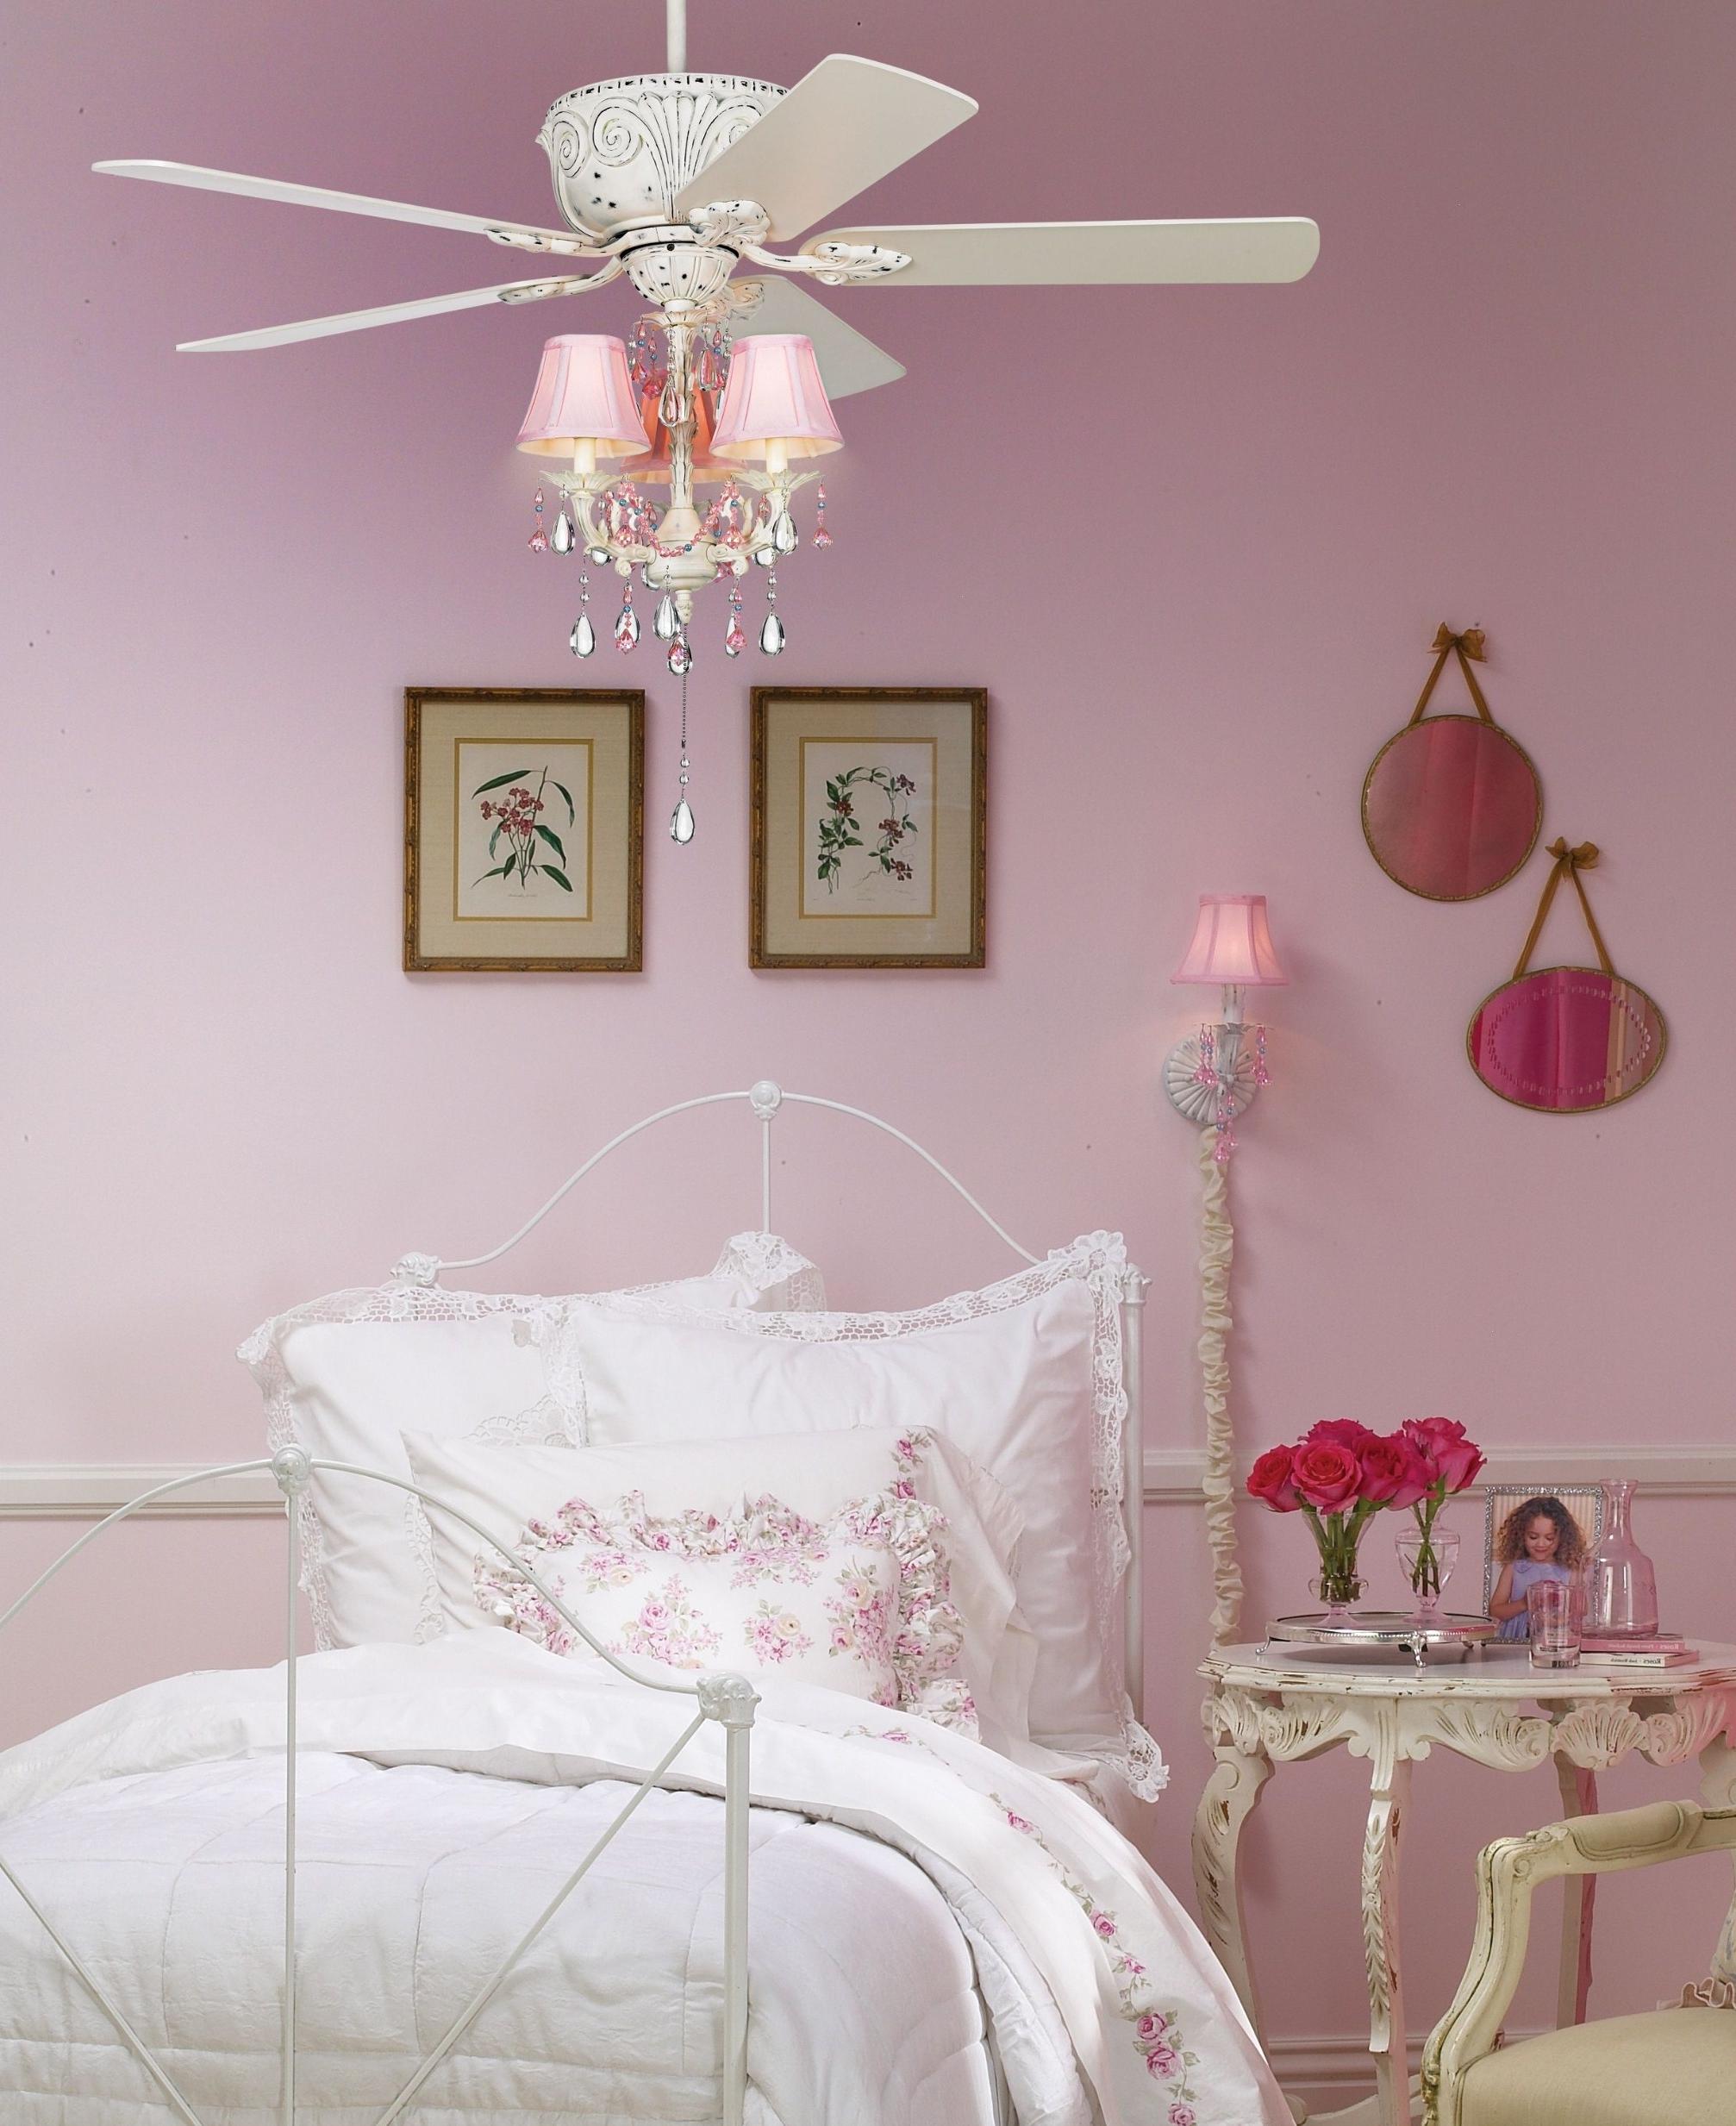 Kids Bedroom Chandeliers With Well Liked Chandelier For Girl Bedroom – Internetunblock – Internetunblock (View 3 of 15)